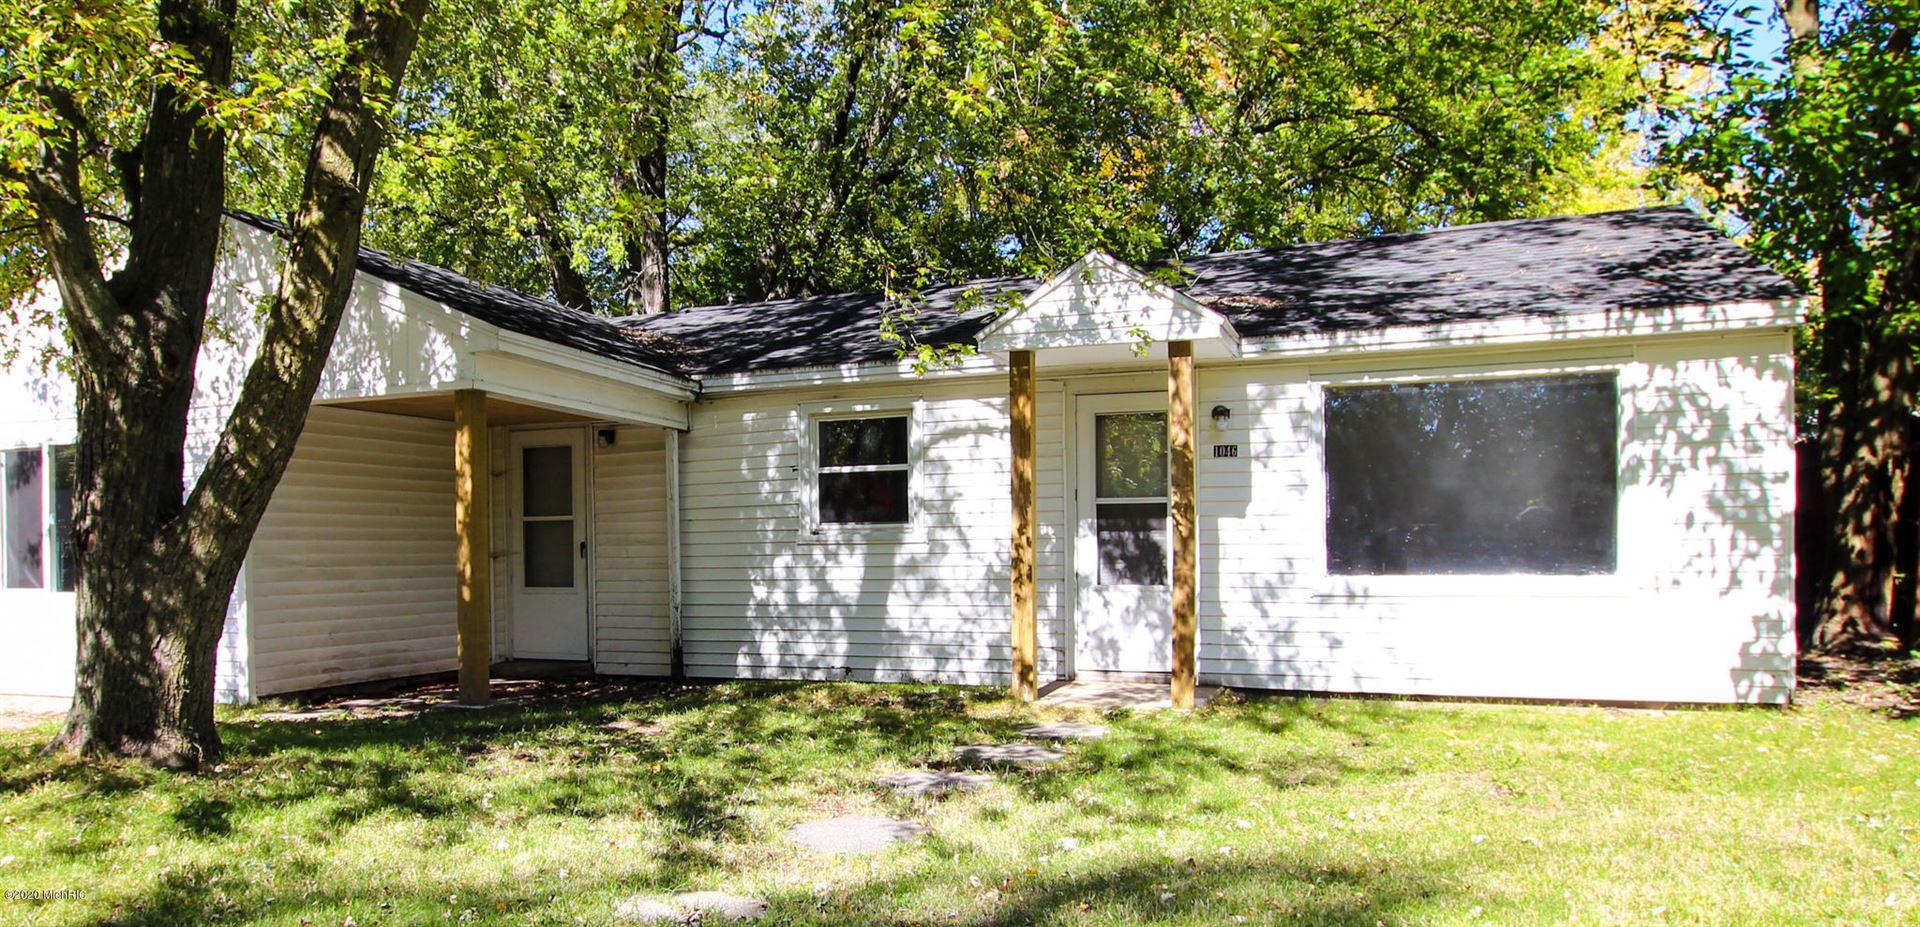 Photo of 1046 Windsor Avenue, Muskegon, MI 49441 (MLS # 21005632)